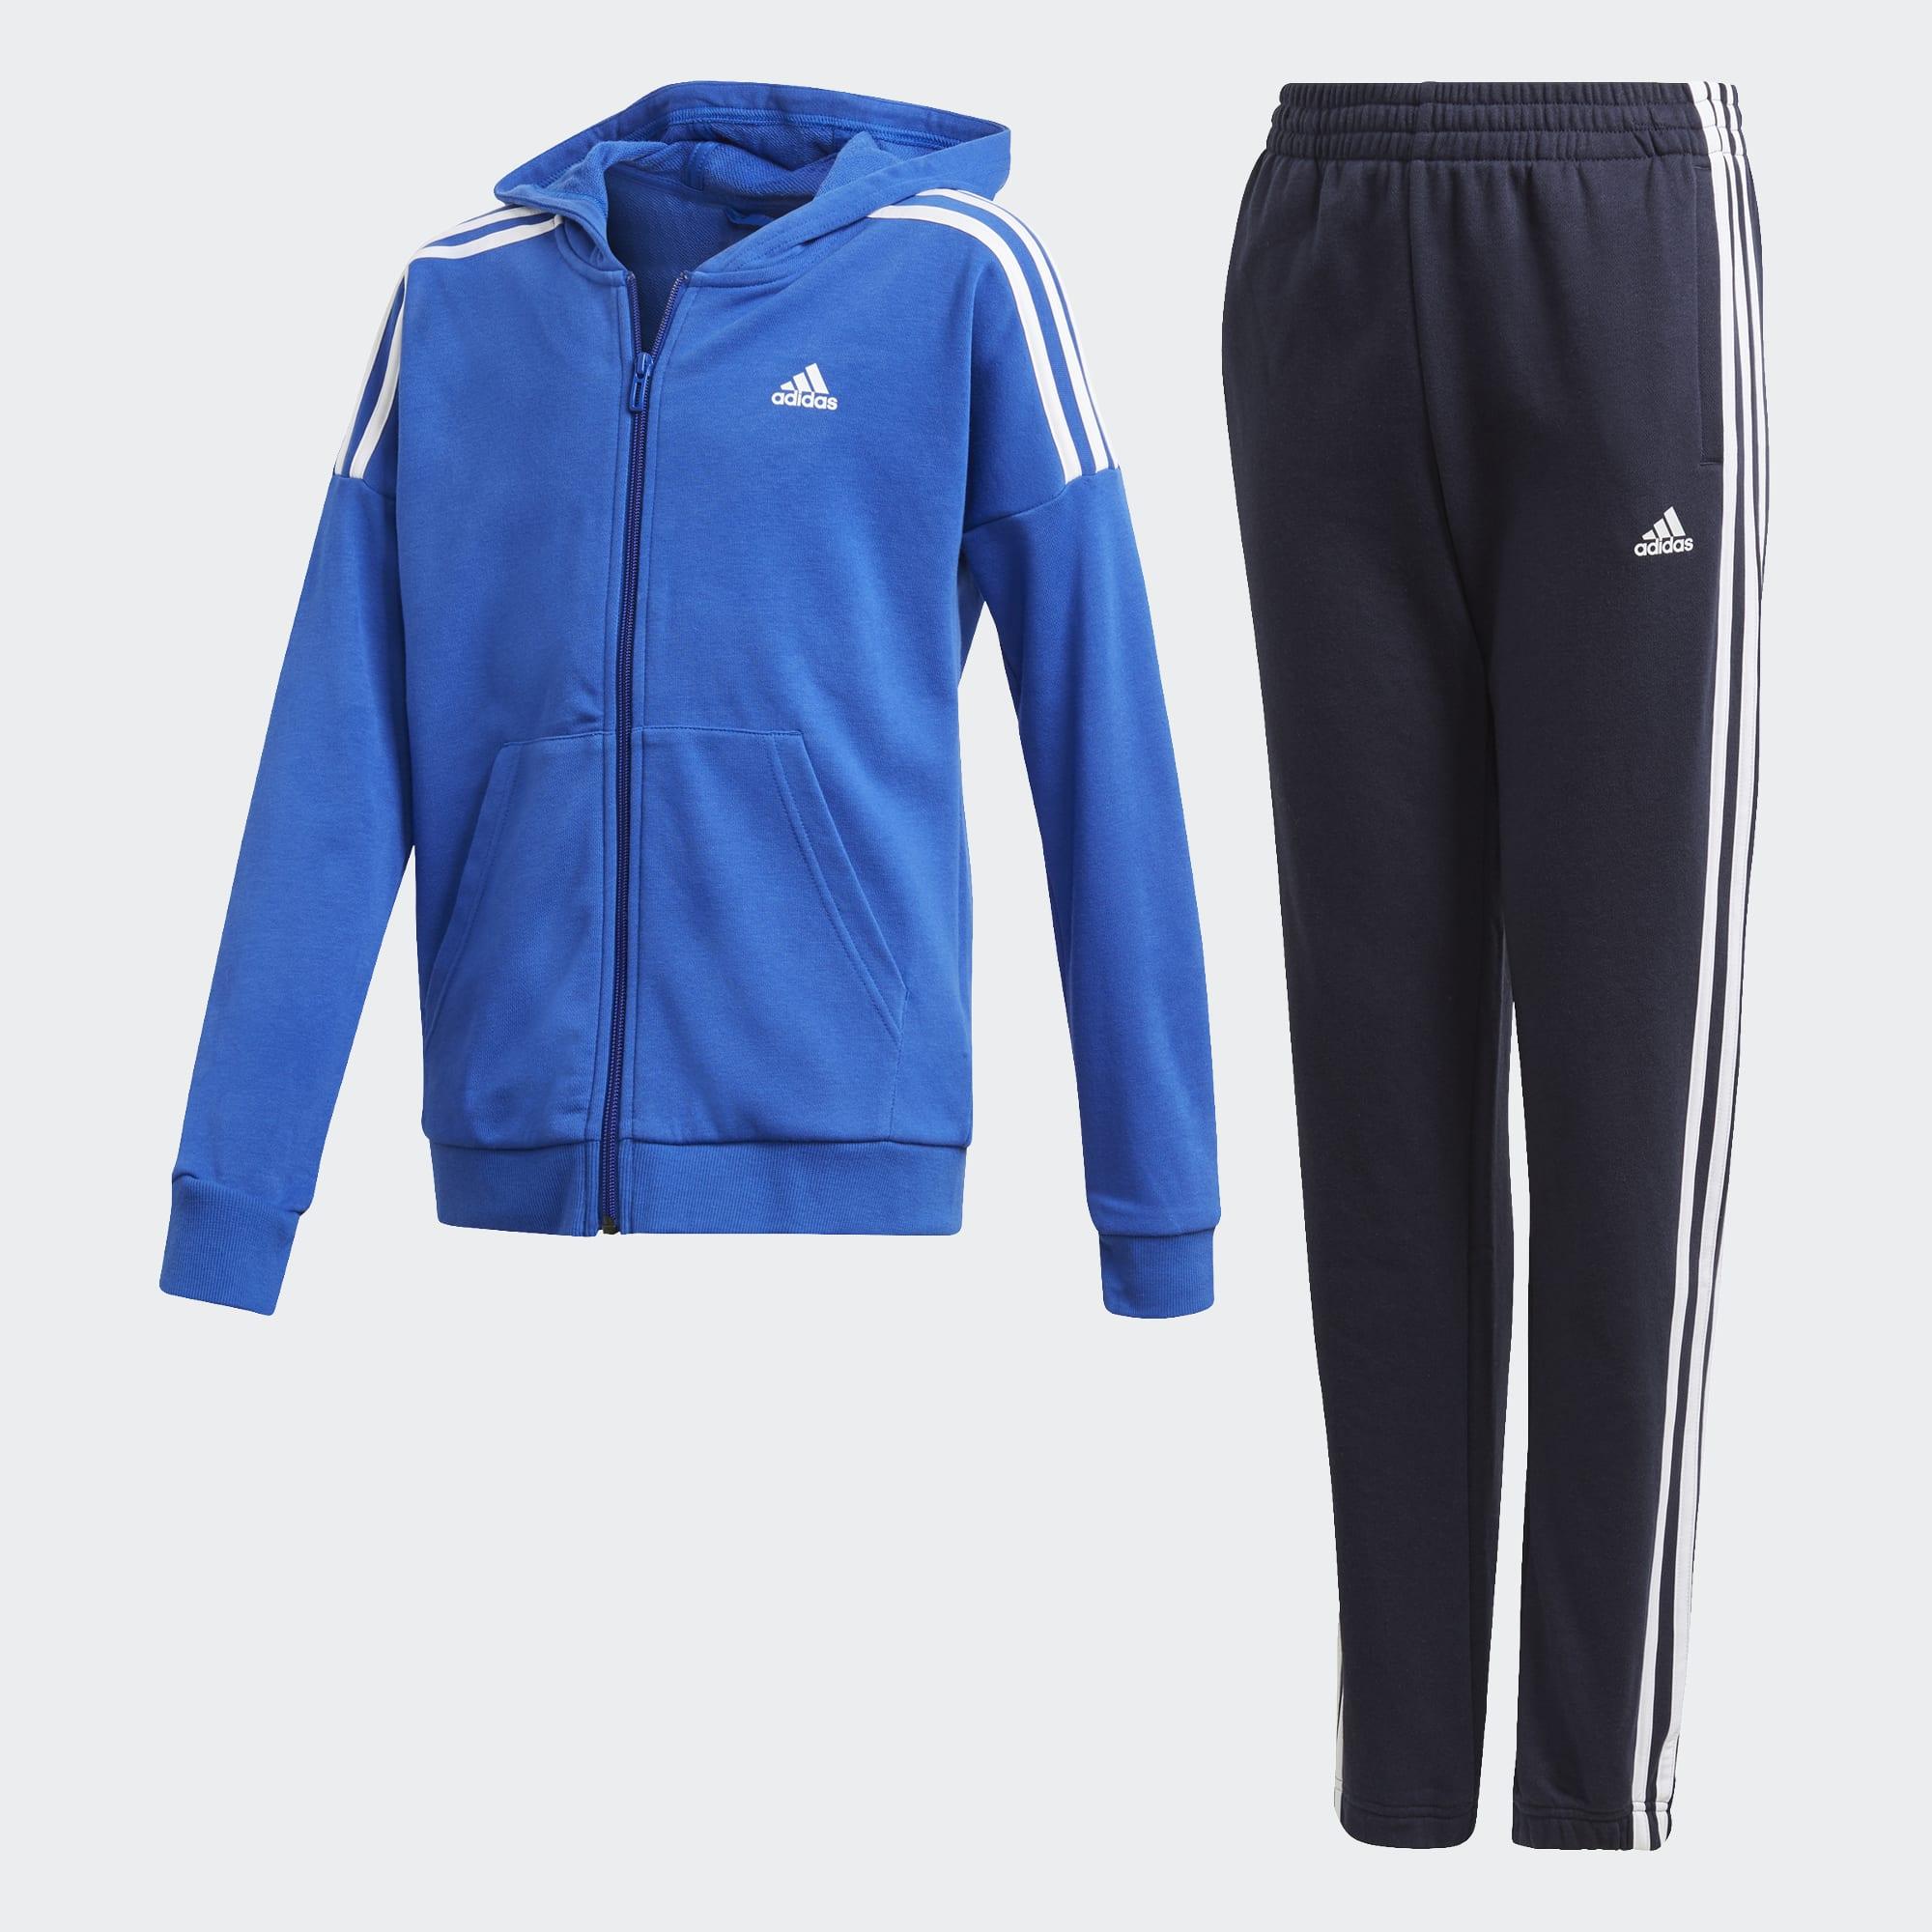 Adidas Trainingsanzug für Kinder